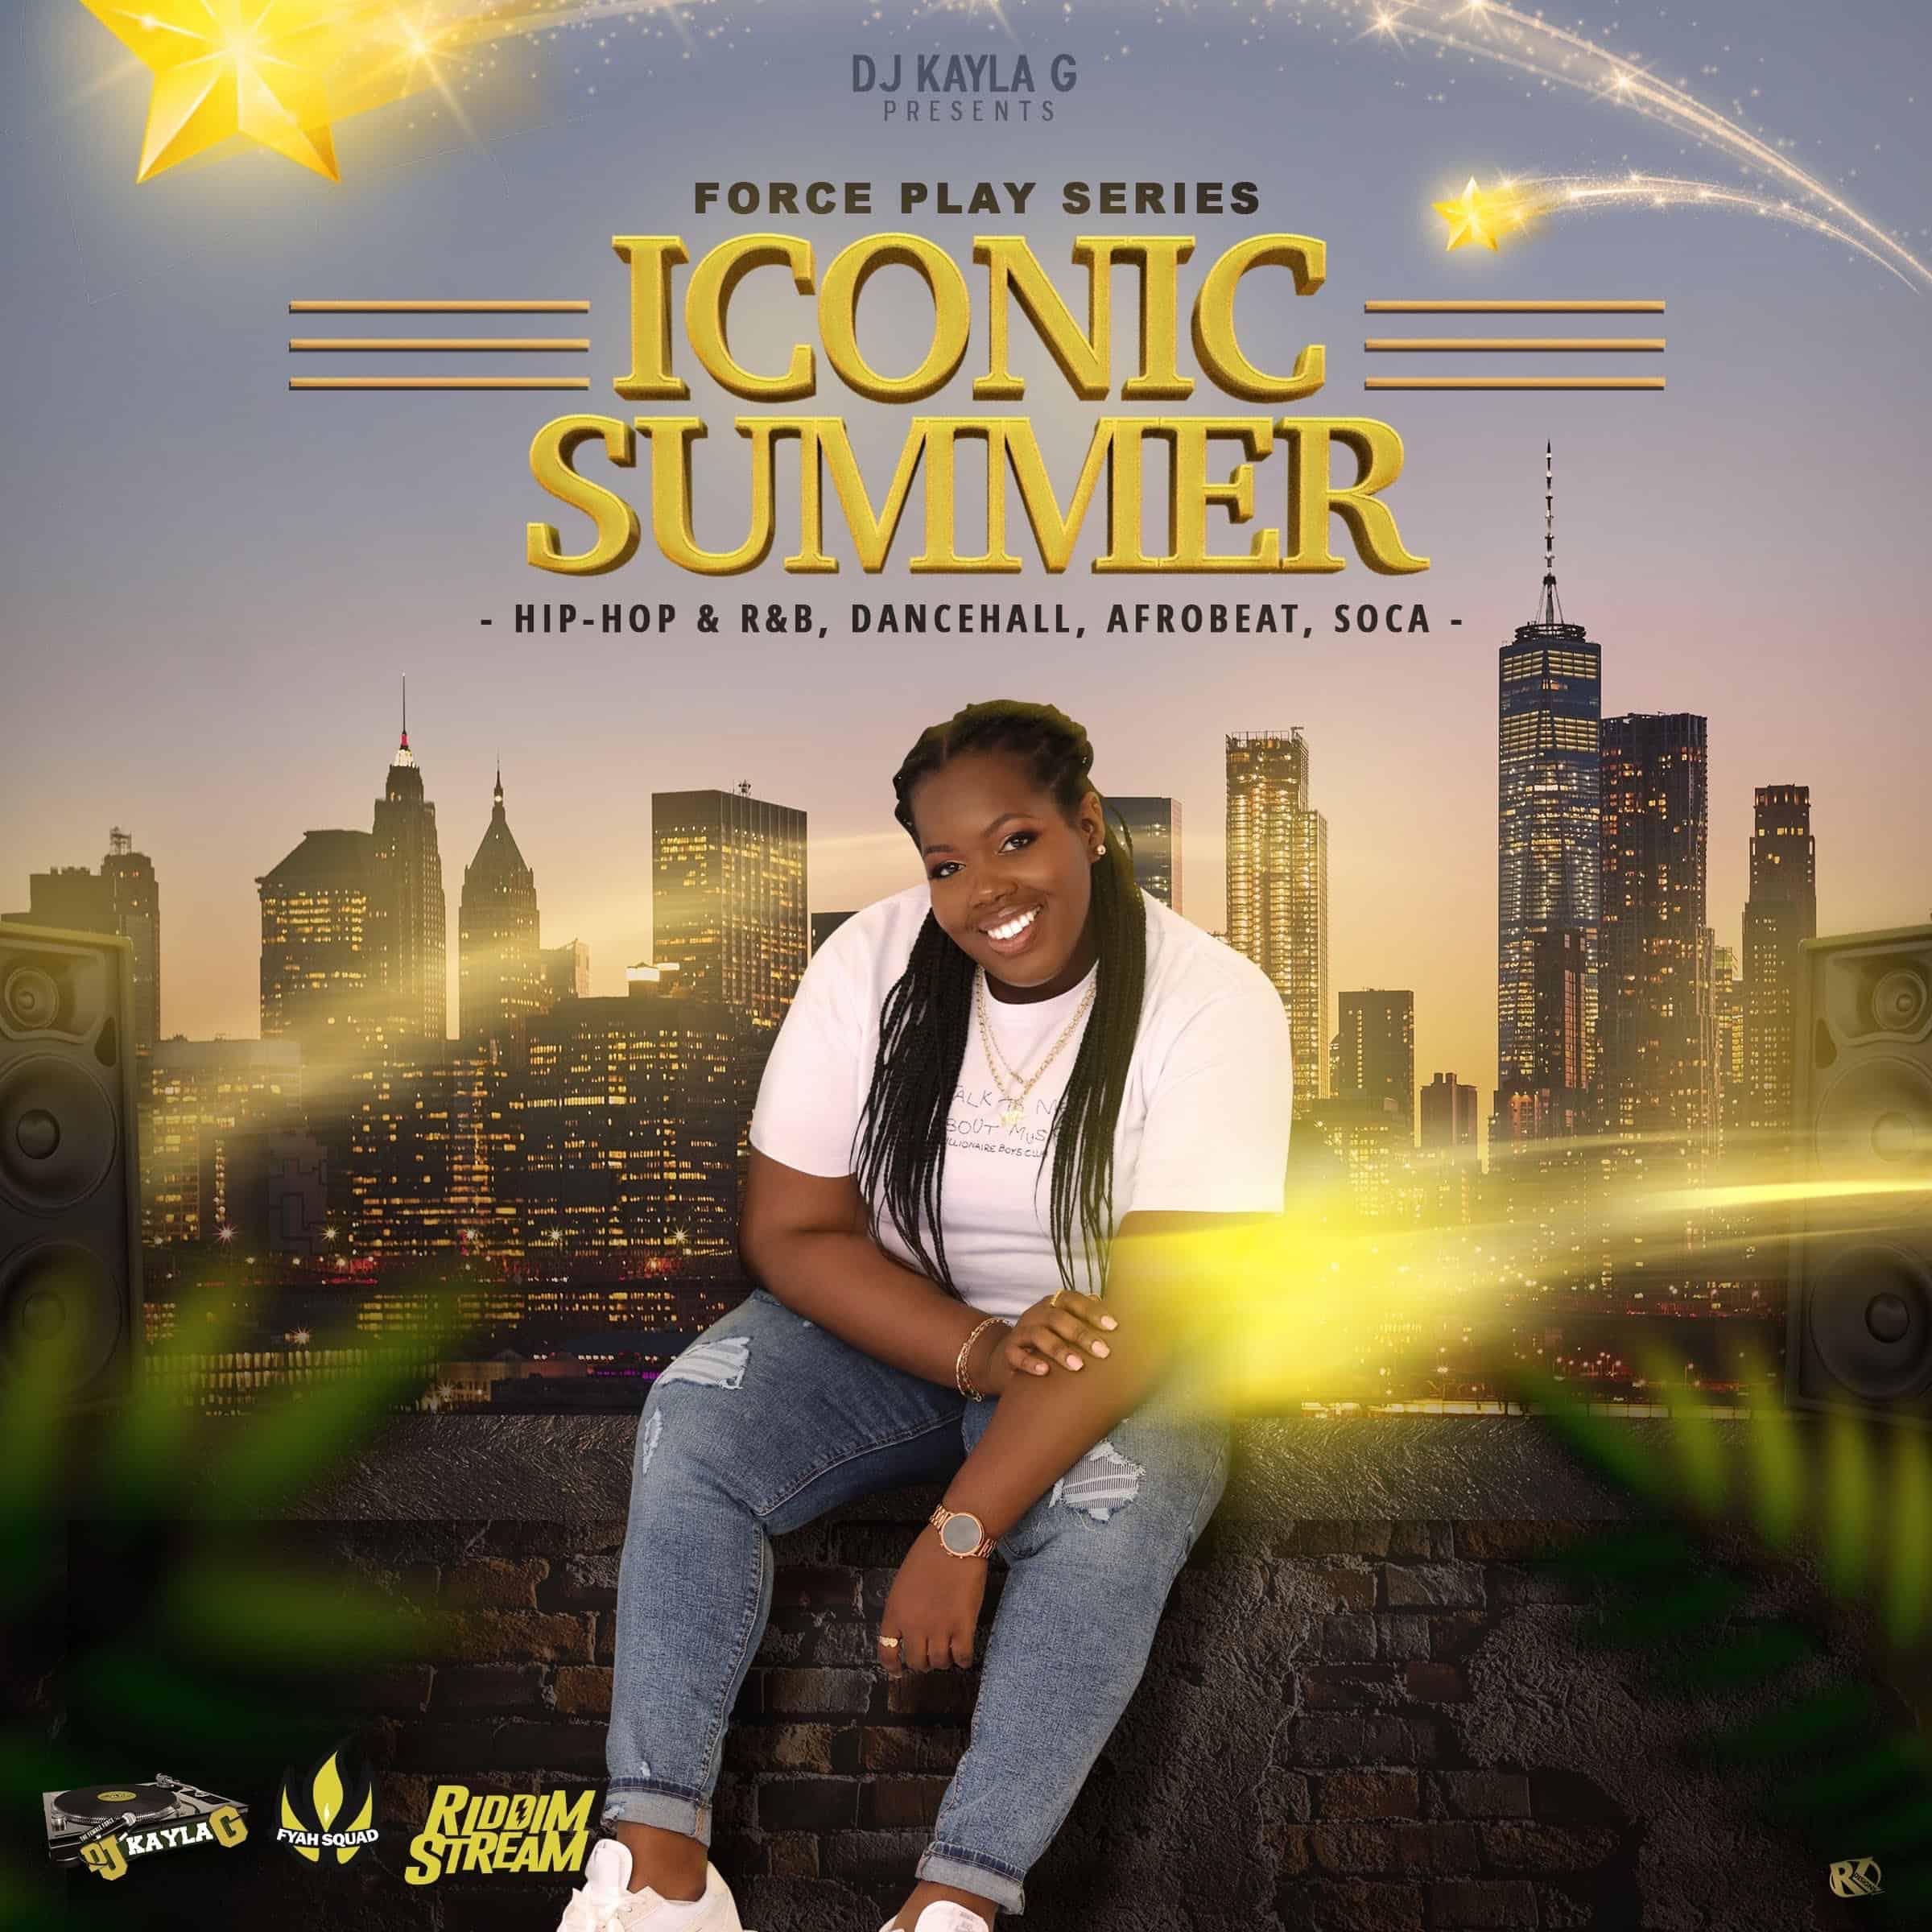 DJ Kayla G - Iconic Summer (2020 Mixtape)